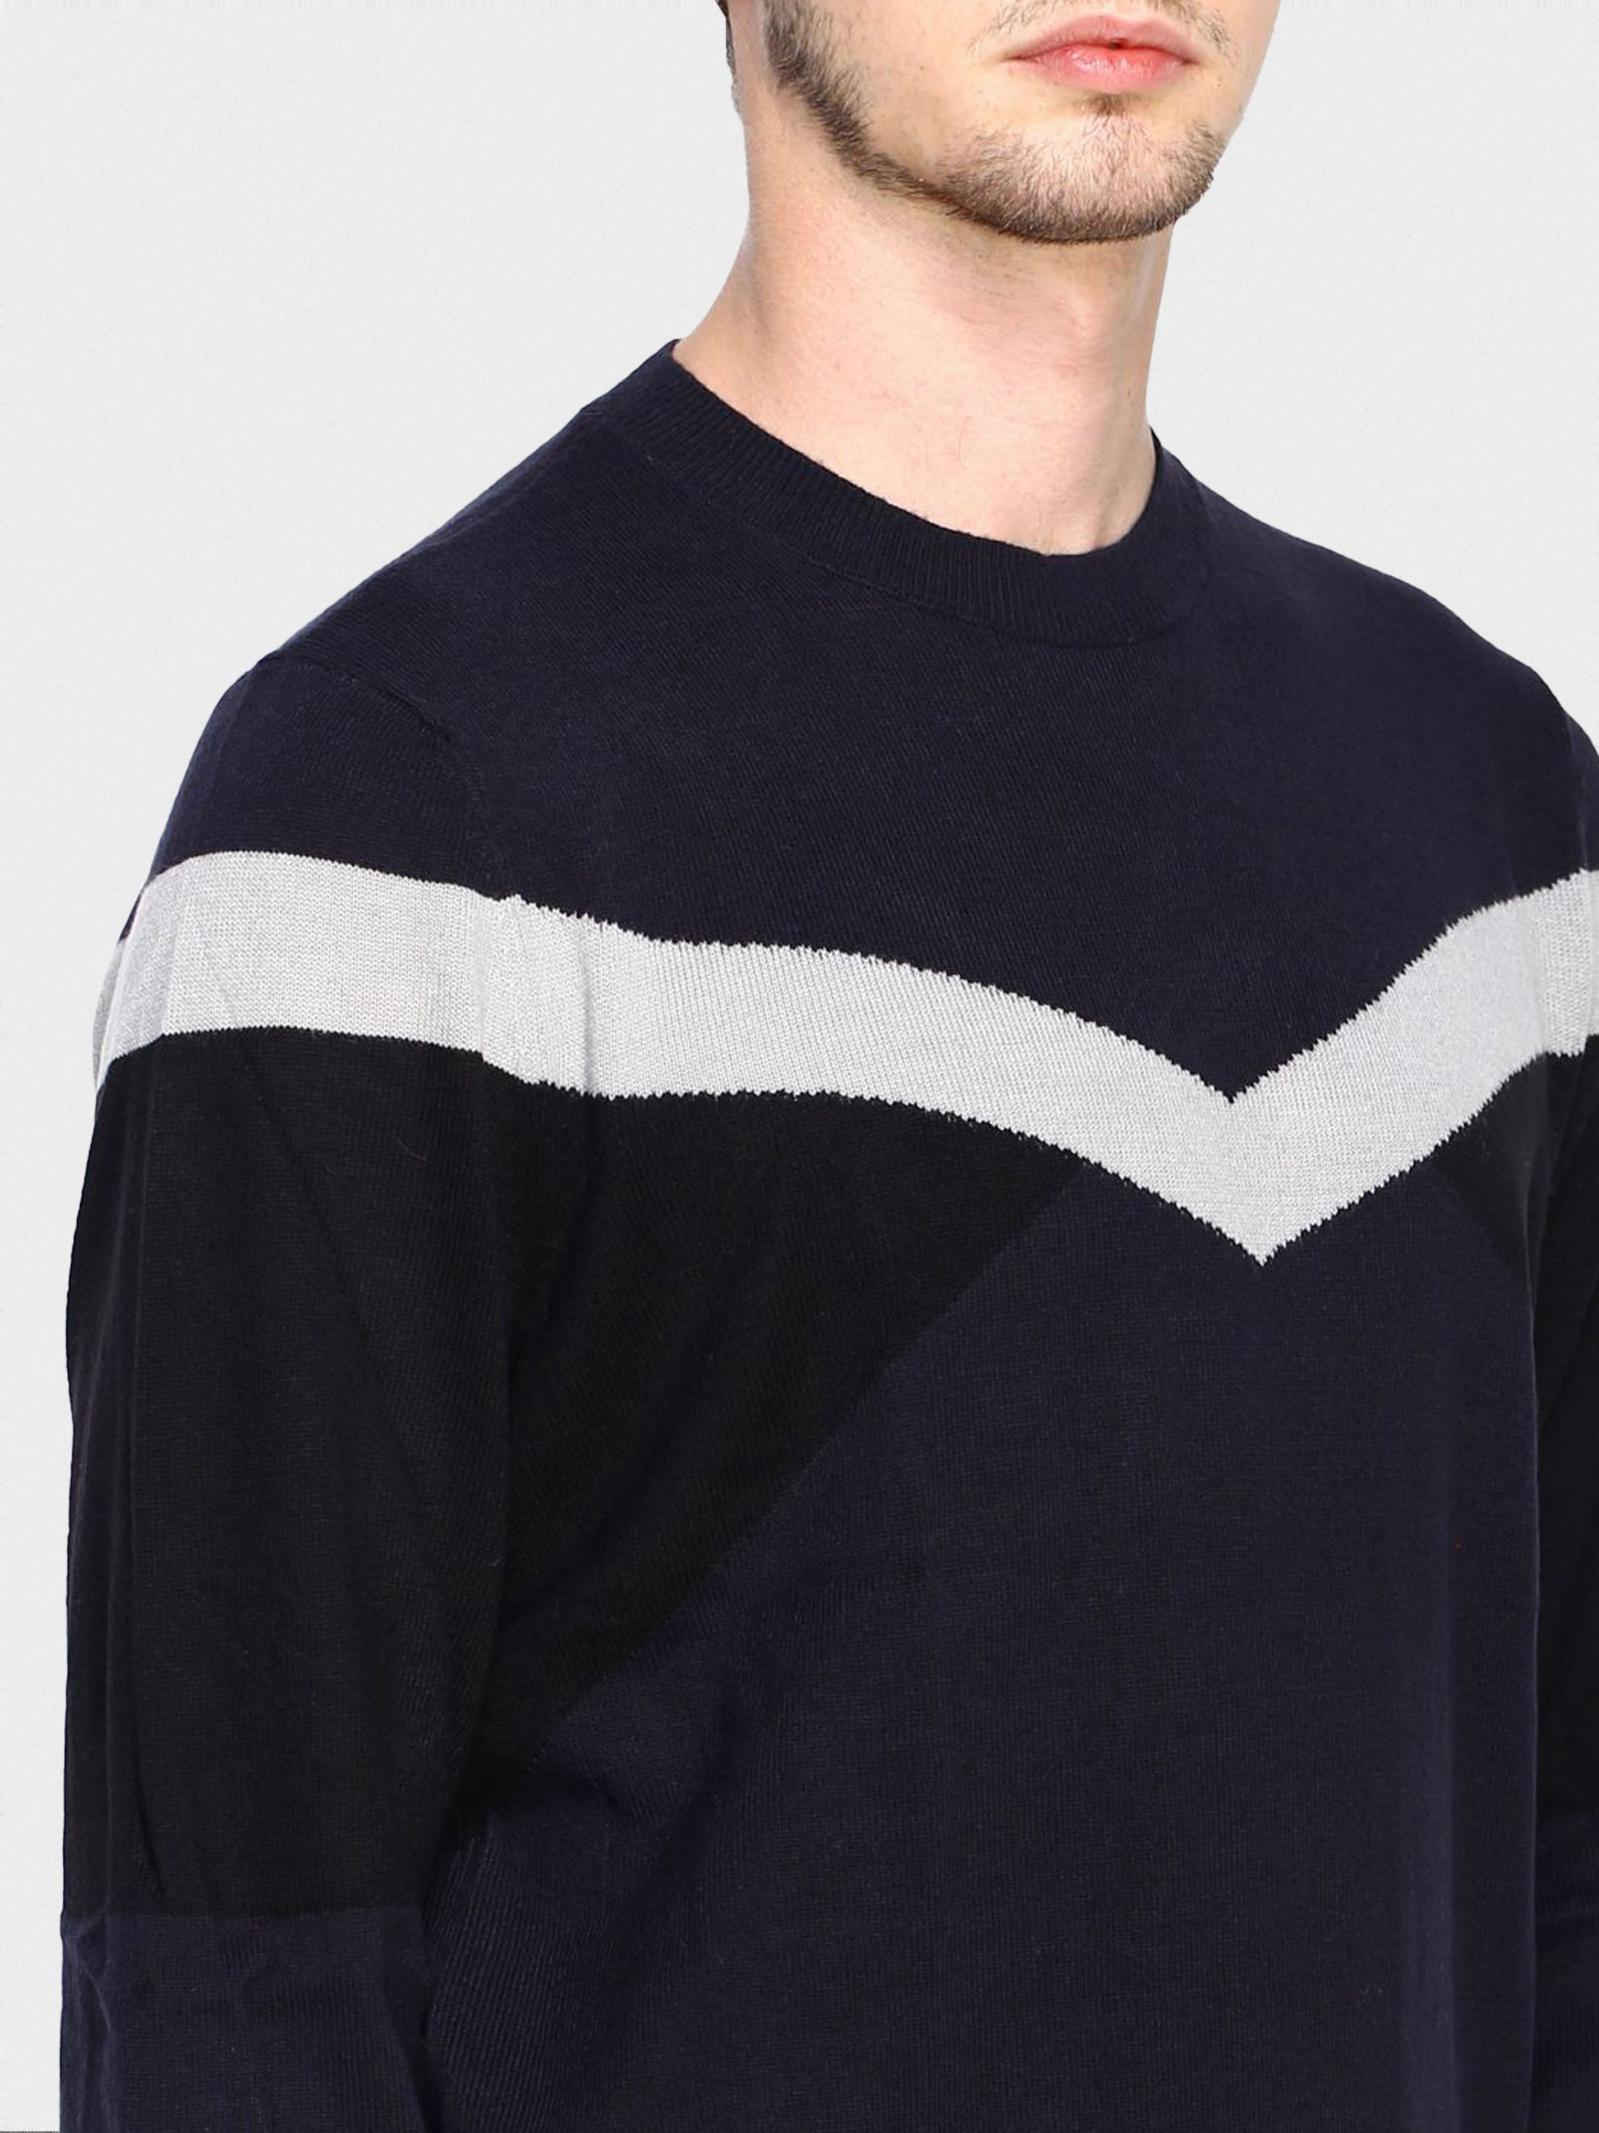 Кофты и свитера мужские Armani Exchange модель WH2451 приобрести, 2017